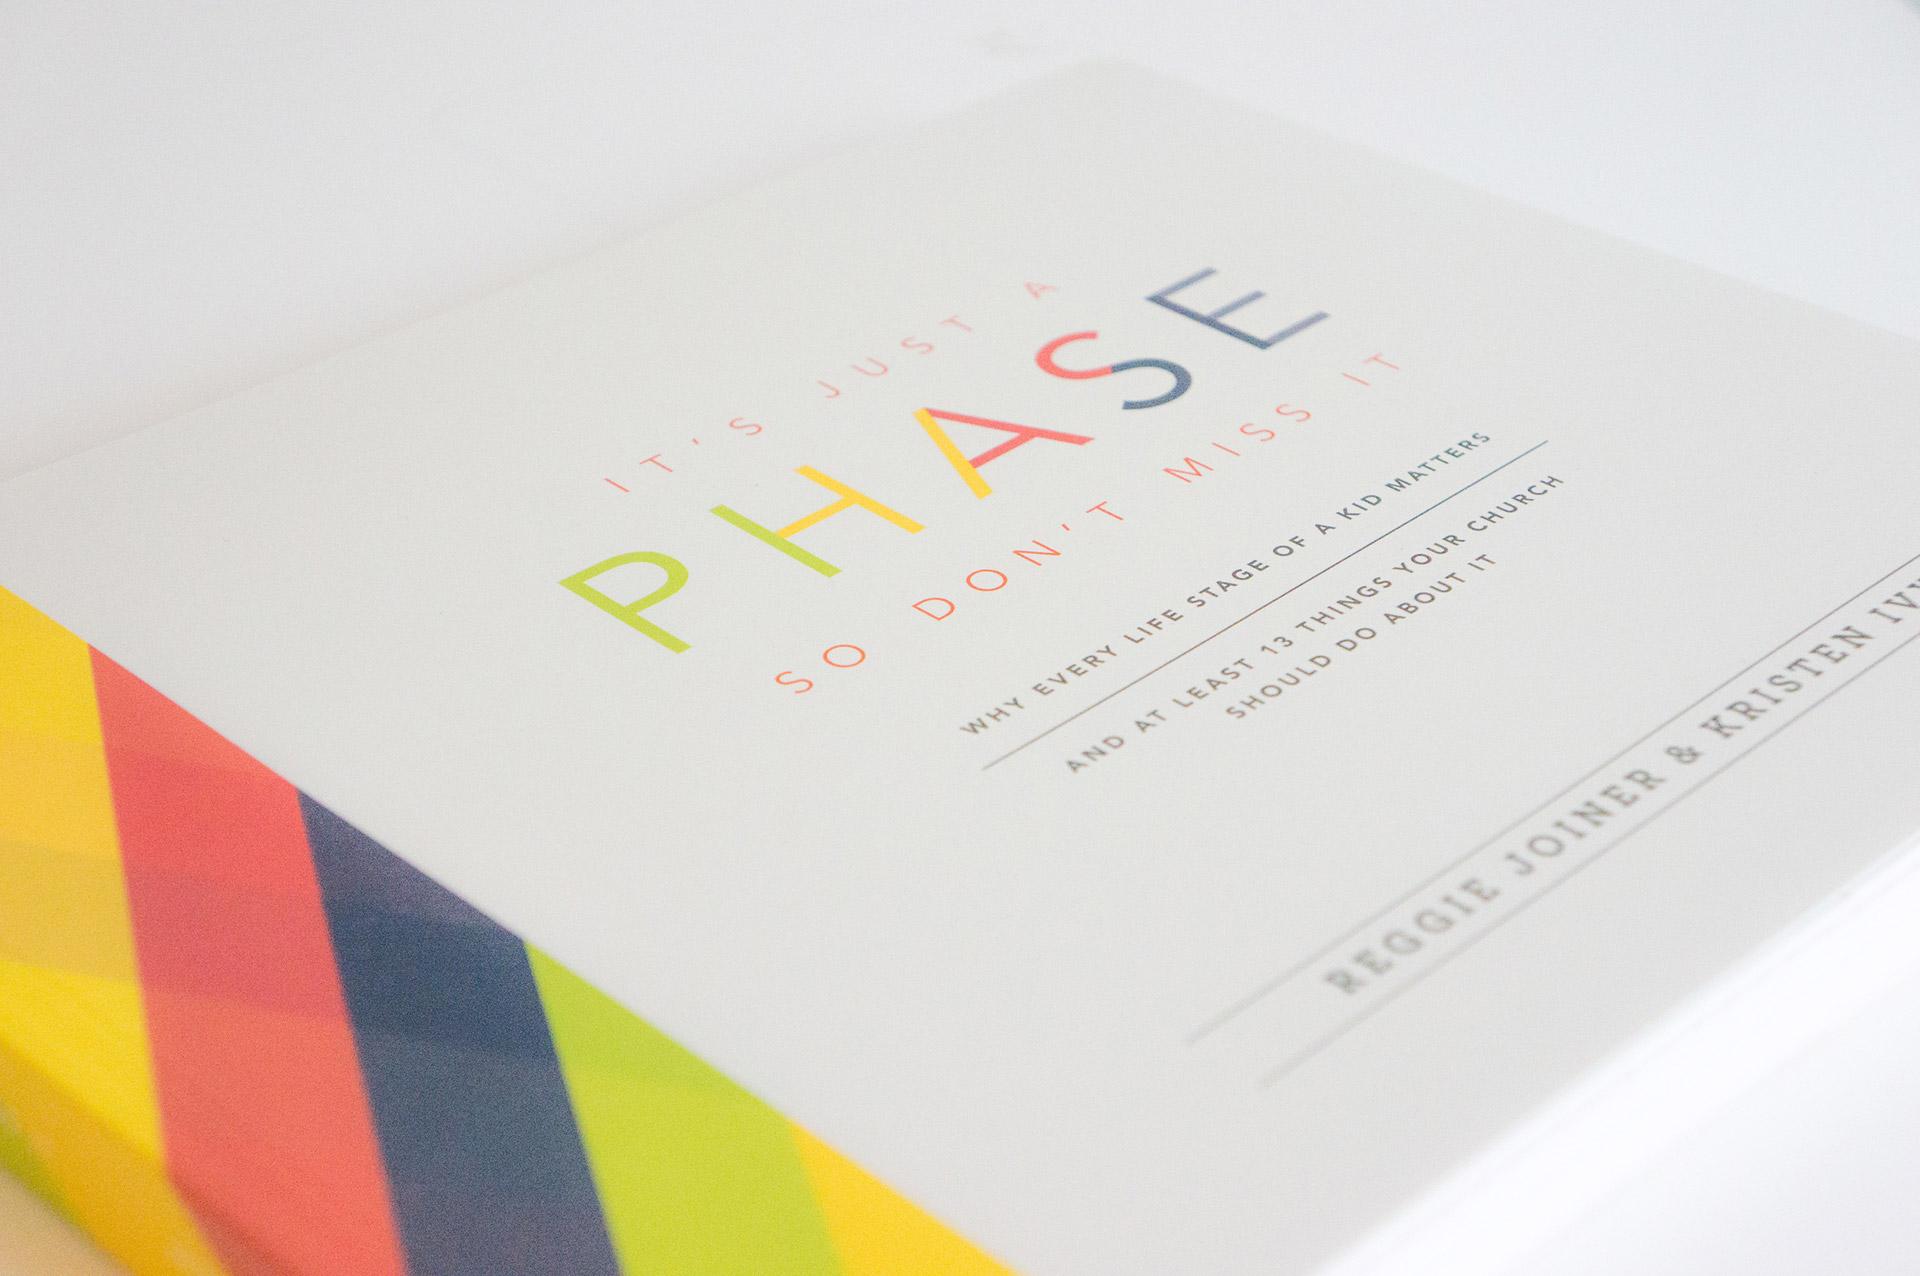 orangeconference-2015-phasebook-01.jpg